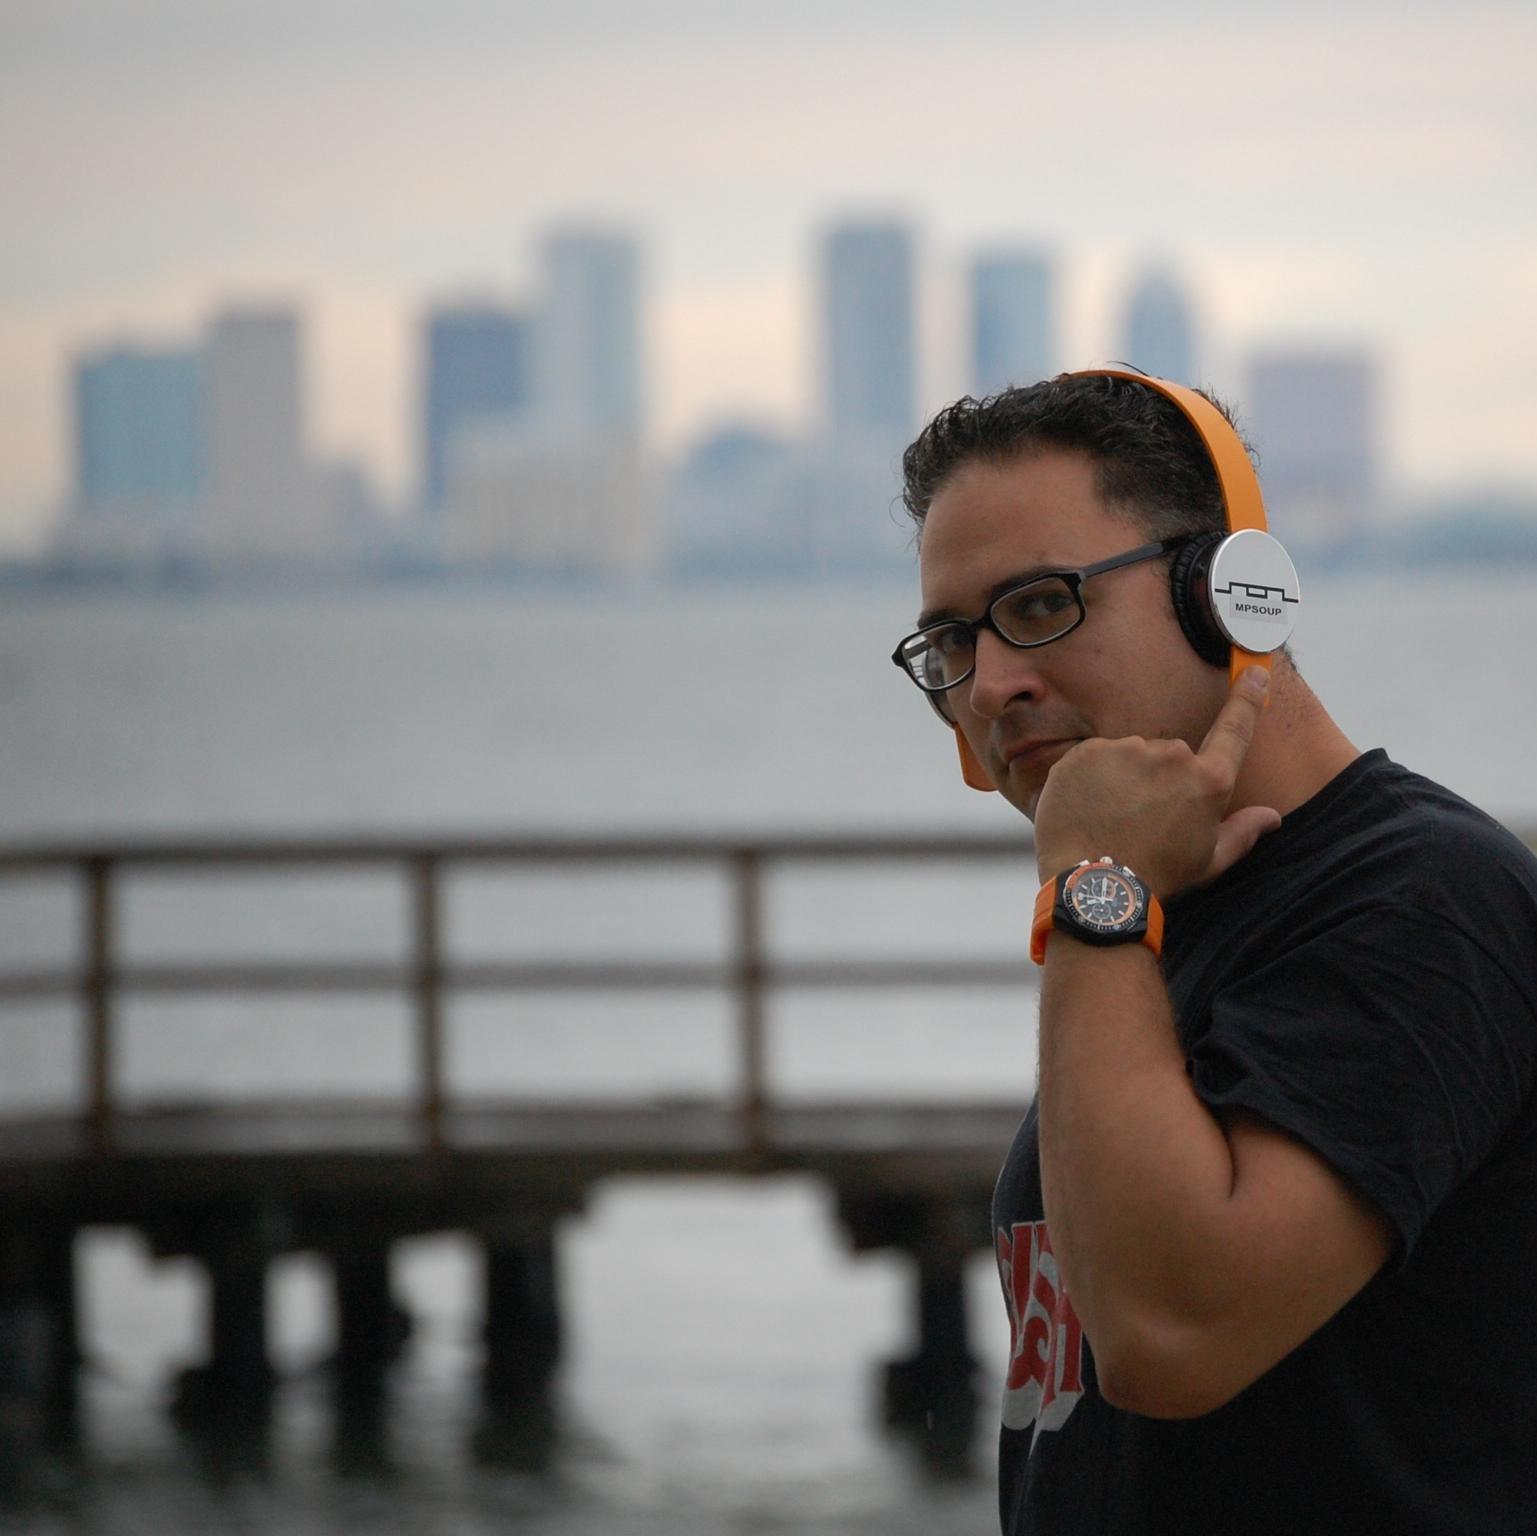 MP Soup Headphones - Scientific Sound Asia